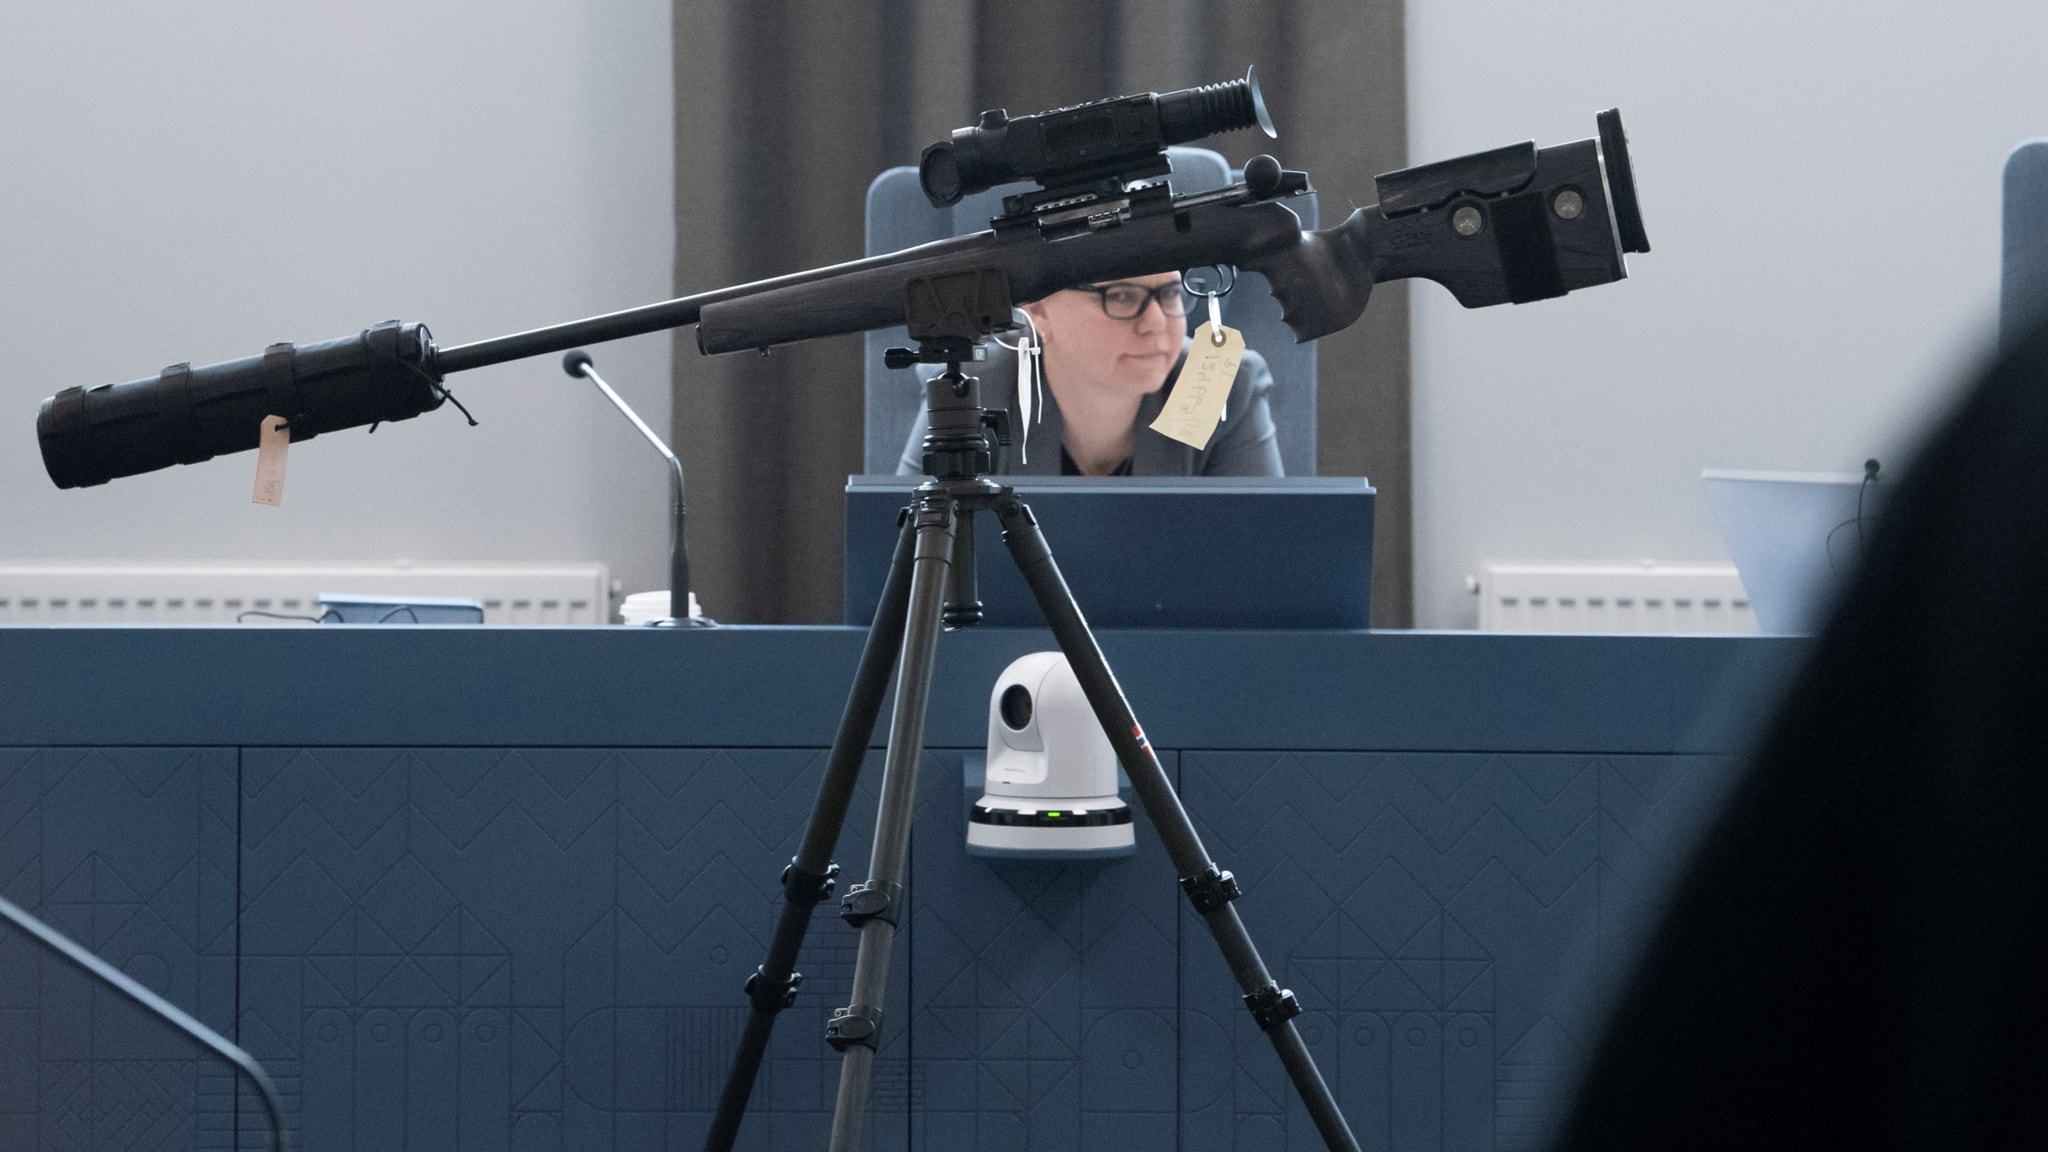 Hunter sentenced, Swede held in Ecuador, new ambassador in China